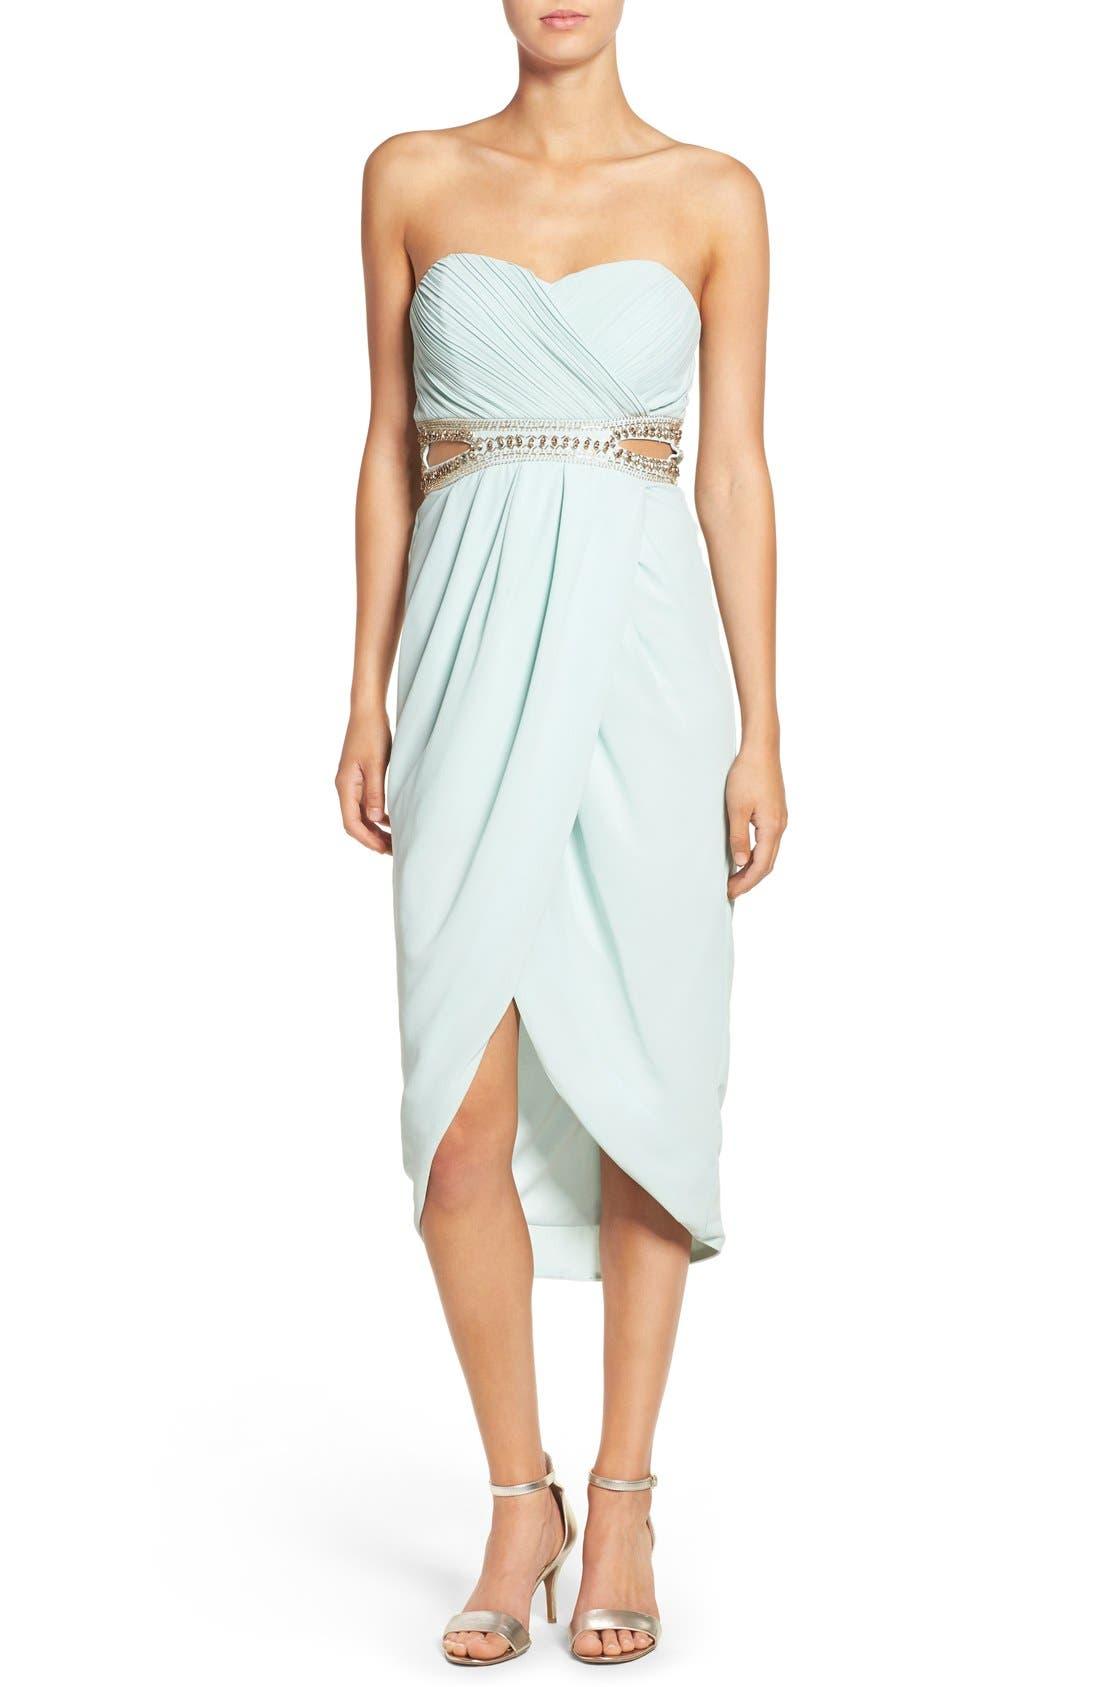 Alternate Image 1 Selected - TFNC 'Catalina' Embellished Strapless Midi Dress